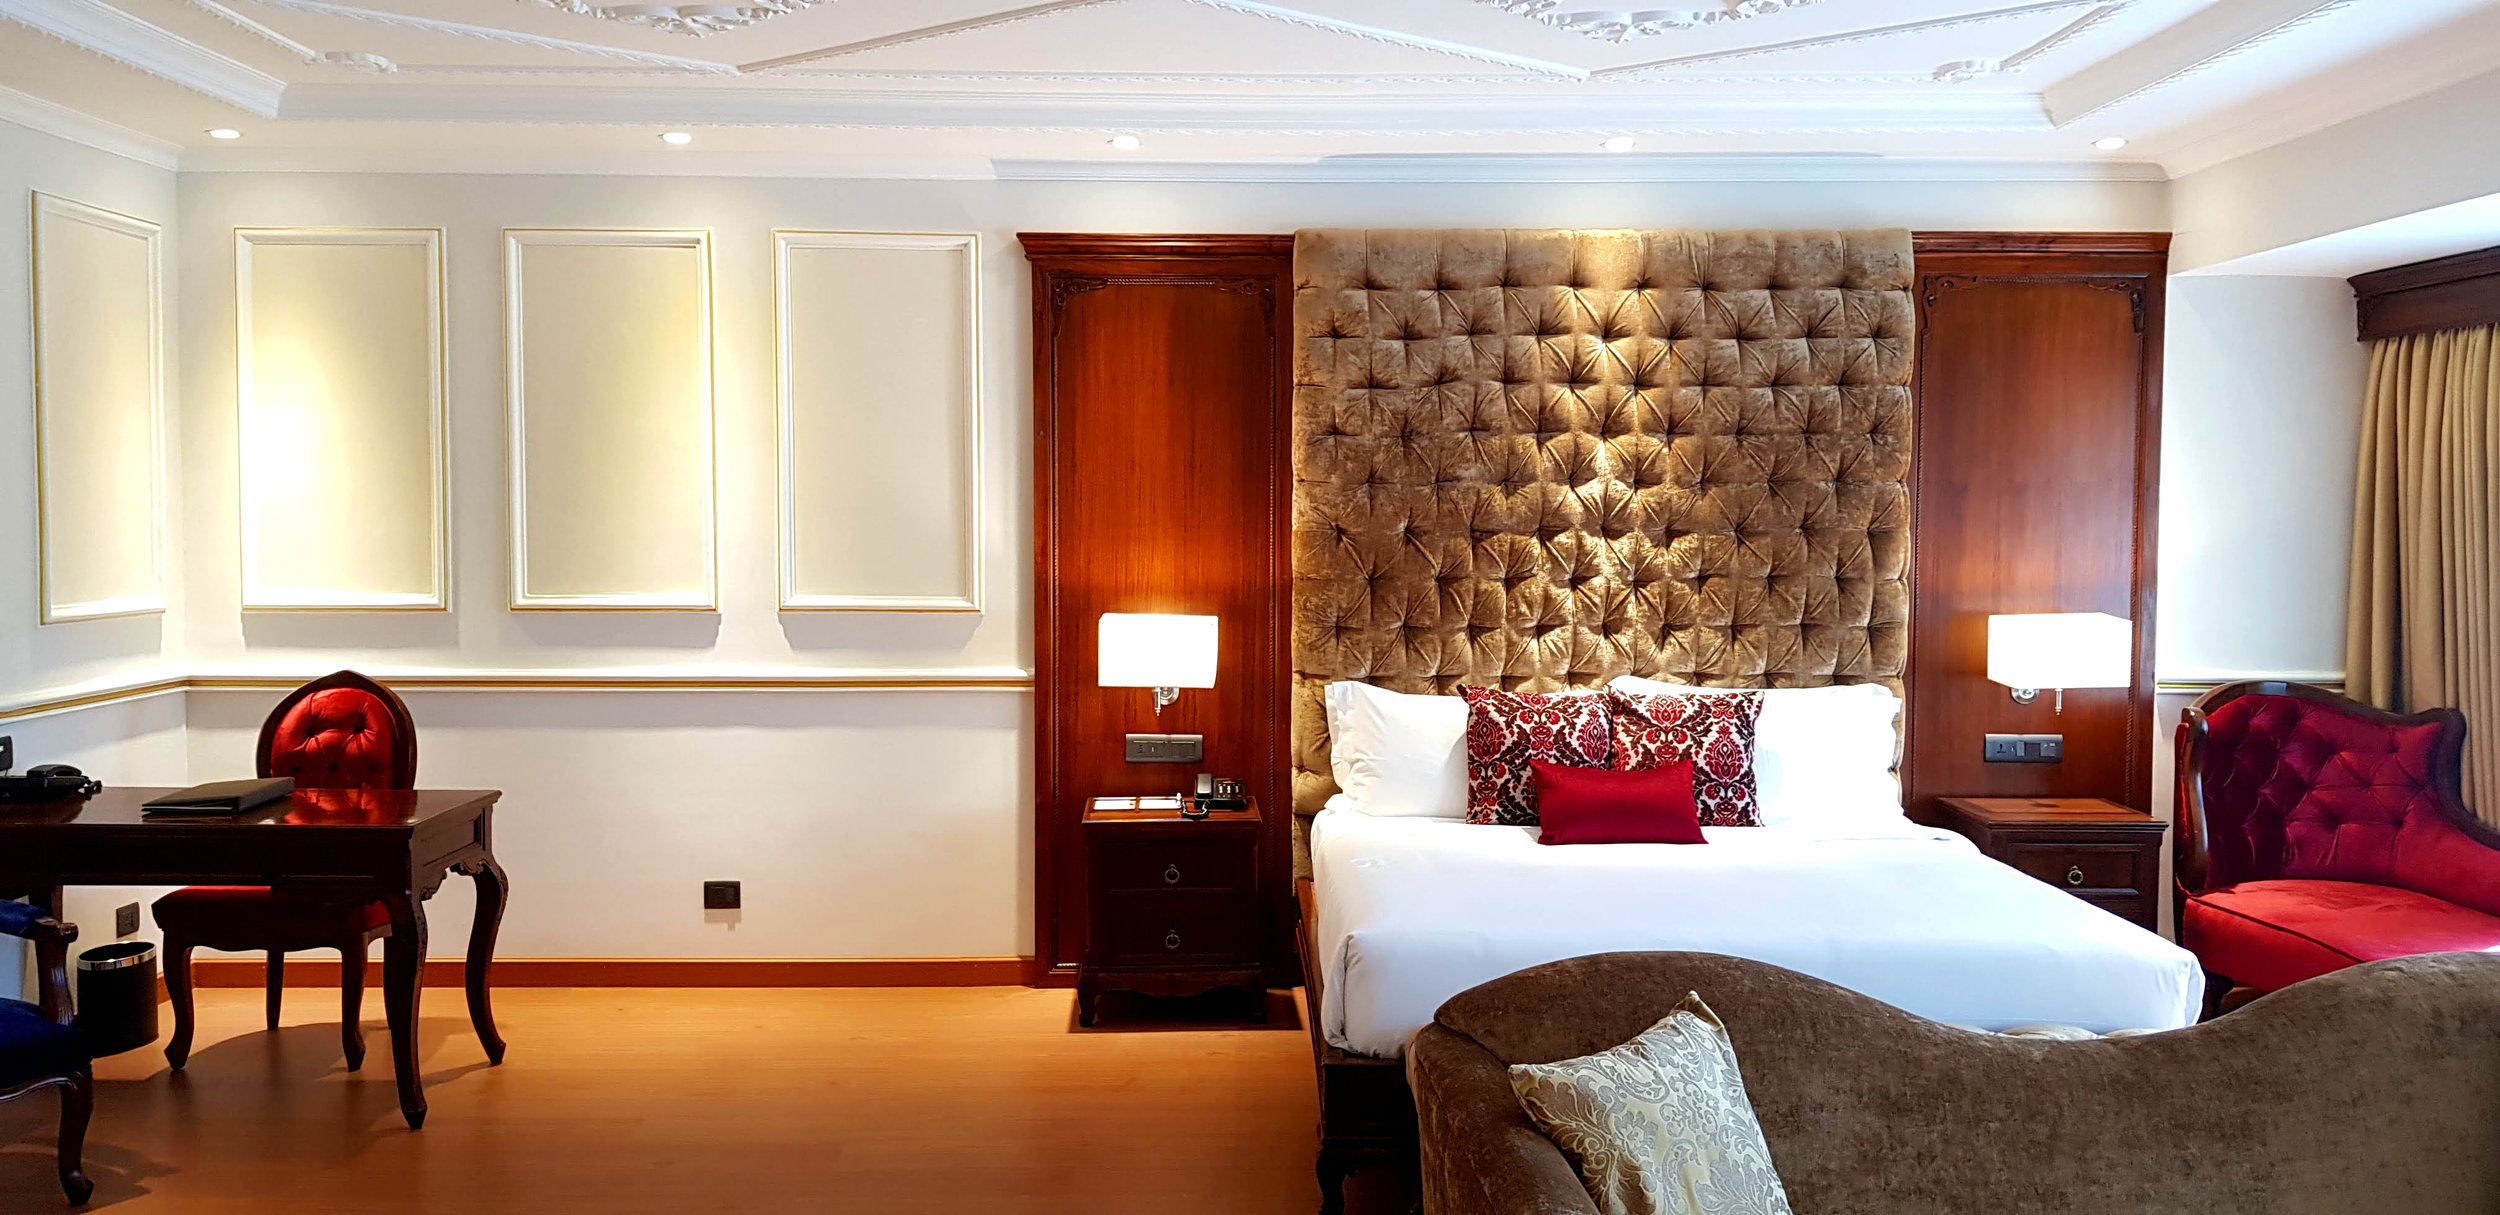 hotels-in-kathmandu-nepal-2019Mar08-2.jpg